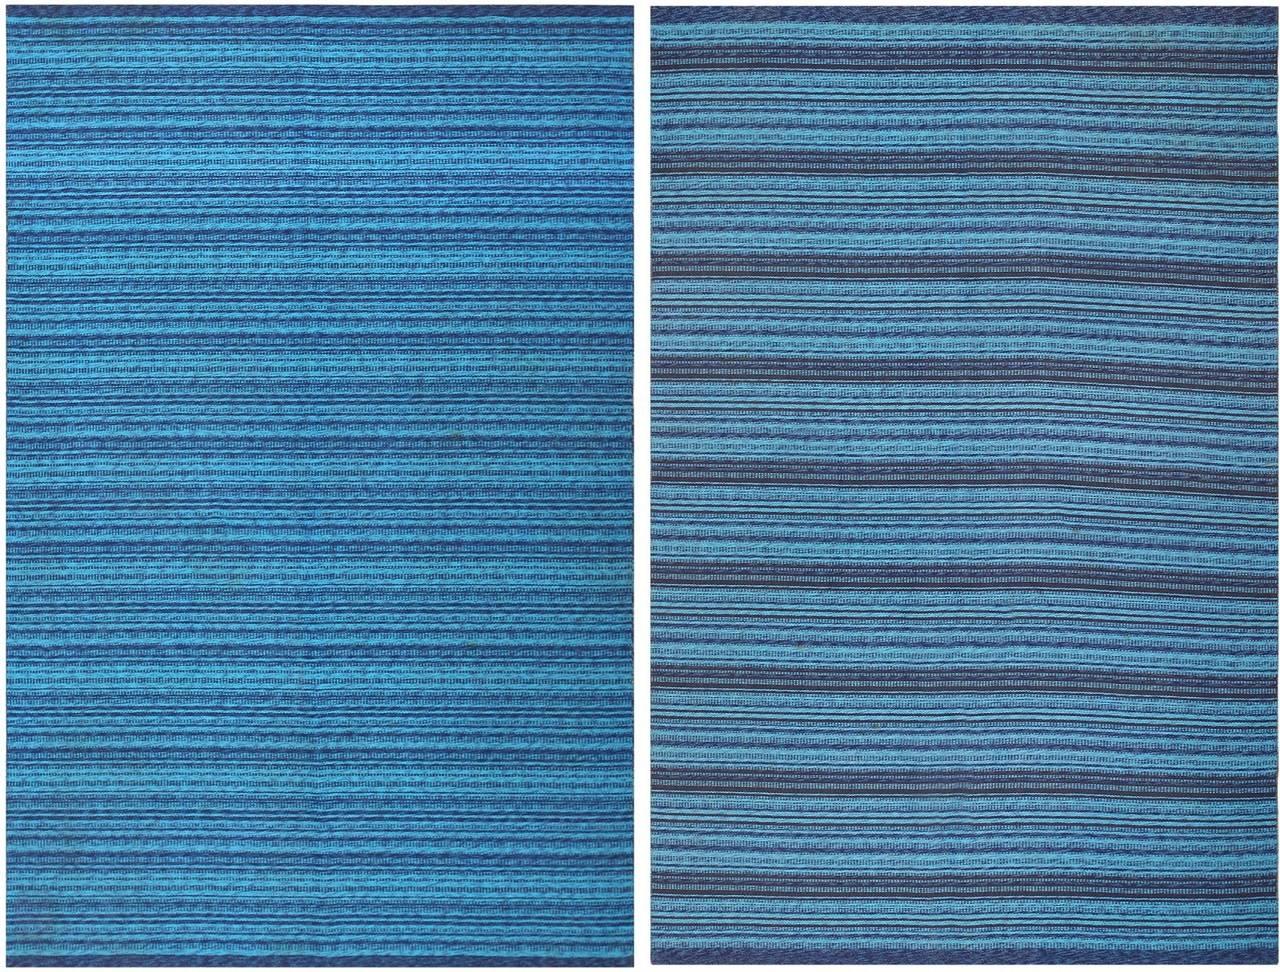 Vintage Double Sided Blue Swedish Kilim For Sale at 1stdibs